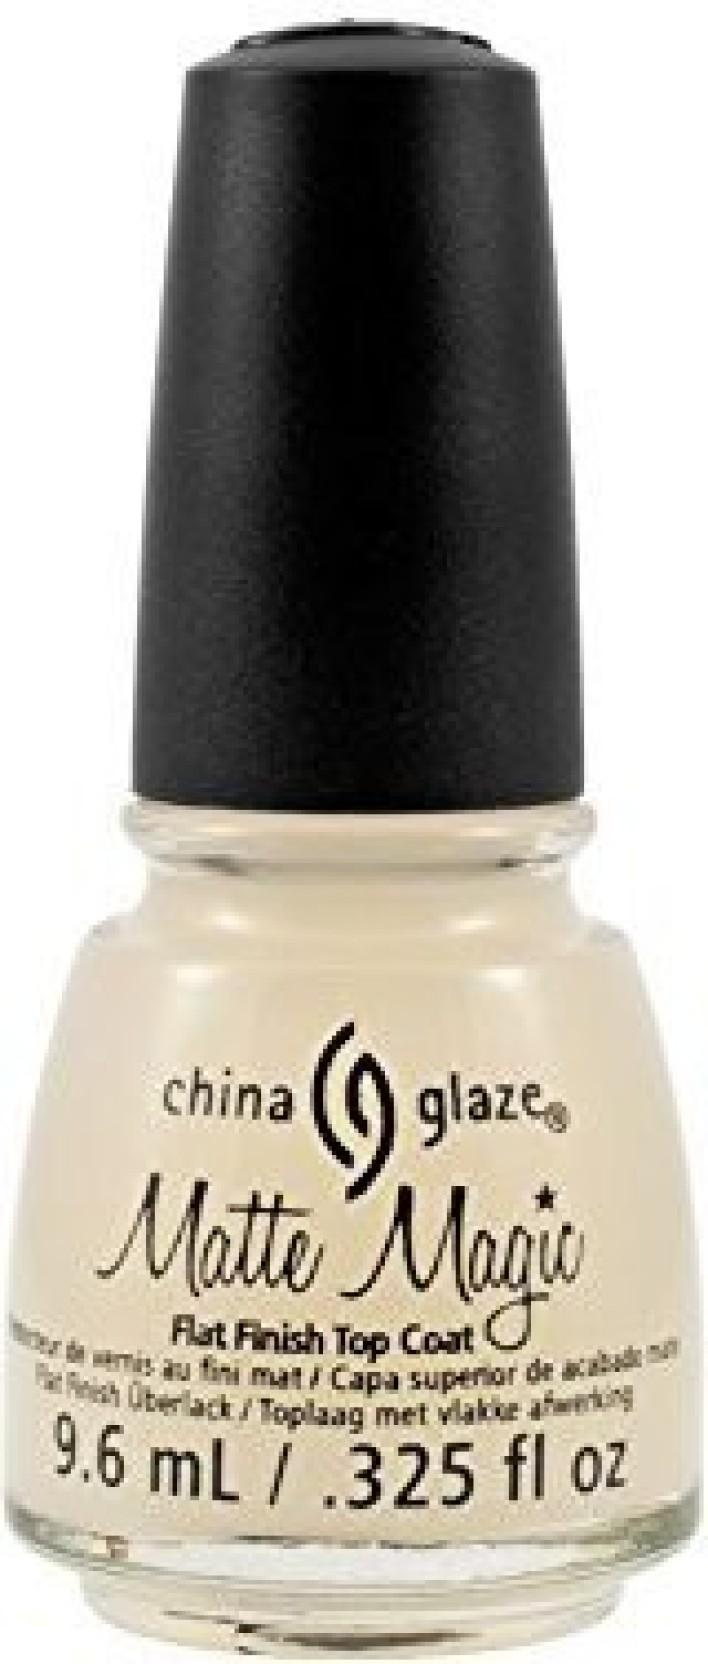 China Glaze Matte Magic Top Coat 81362 Dark - Price in India, Buy ...